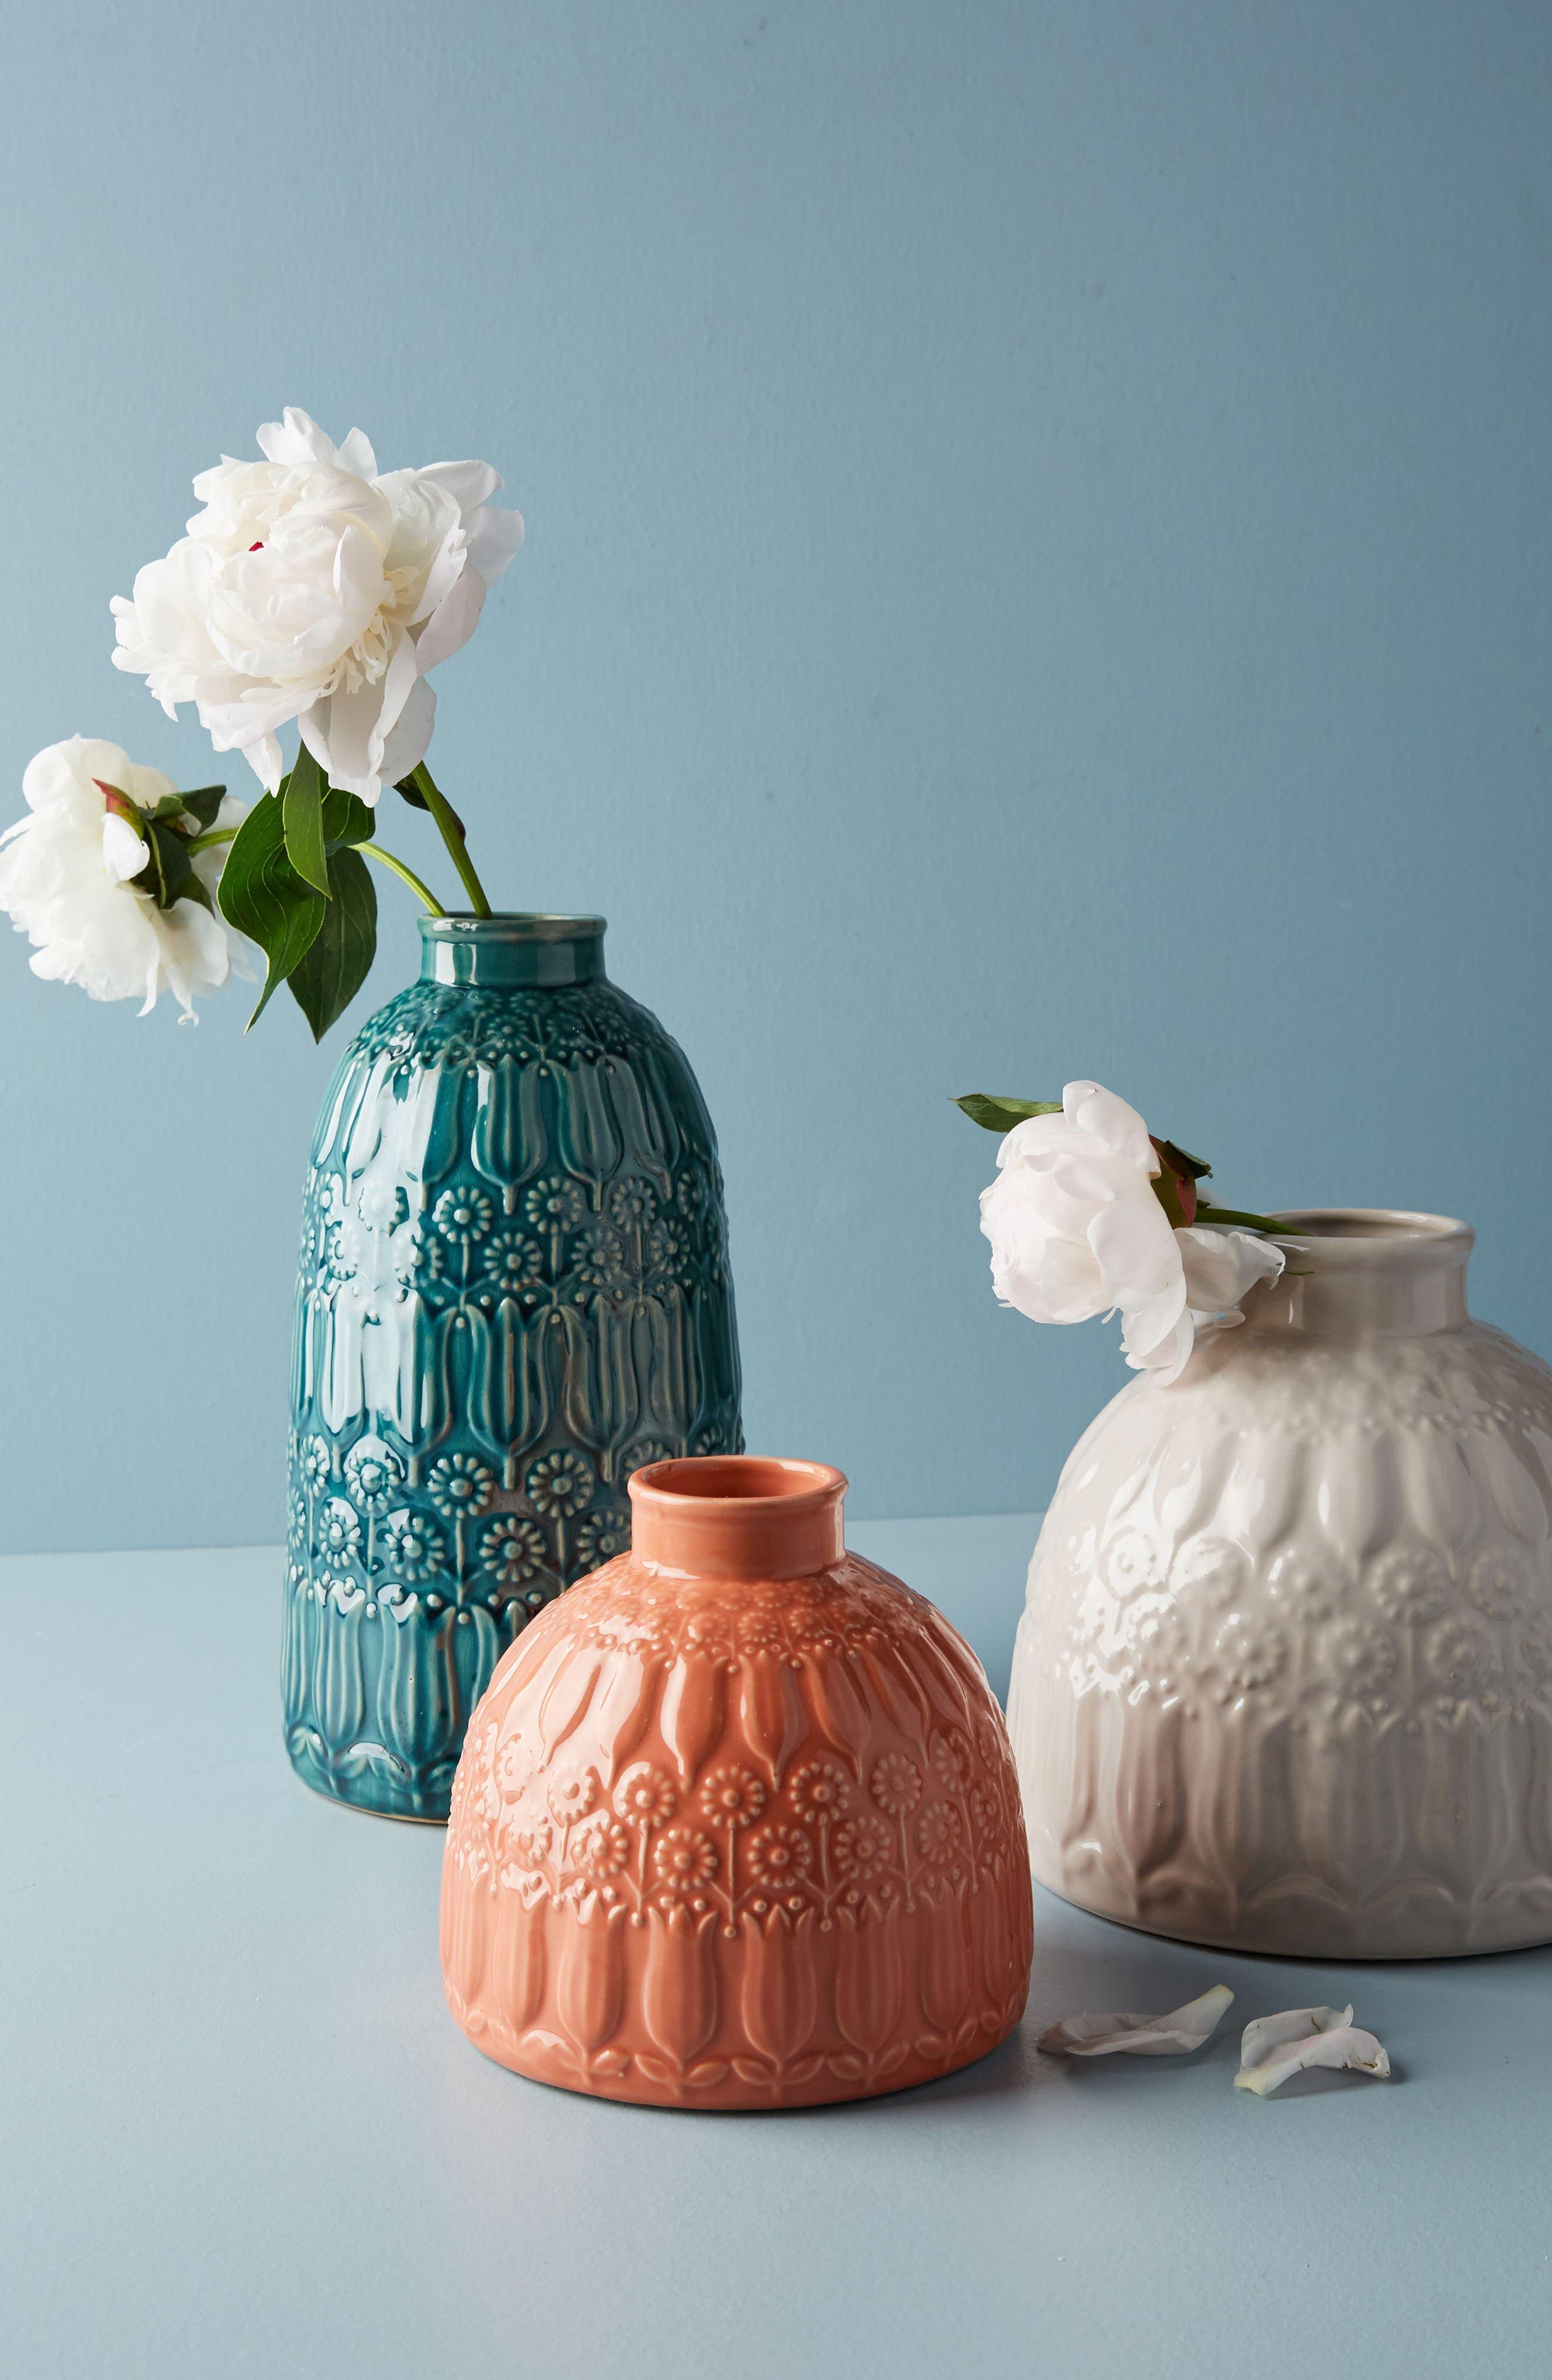 Embossed Floral Vase,                             Alternate thumbnail 3, color,                             Peach